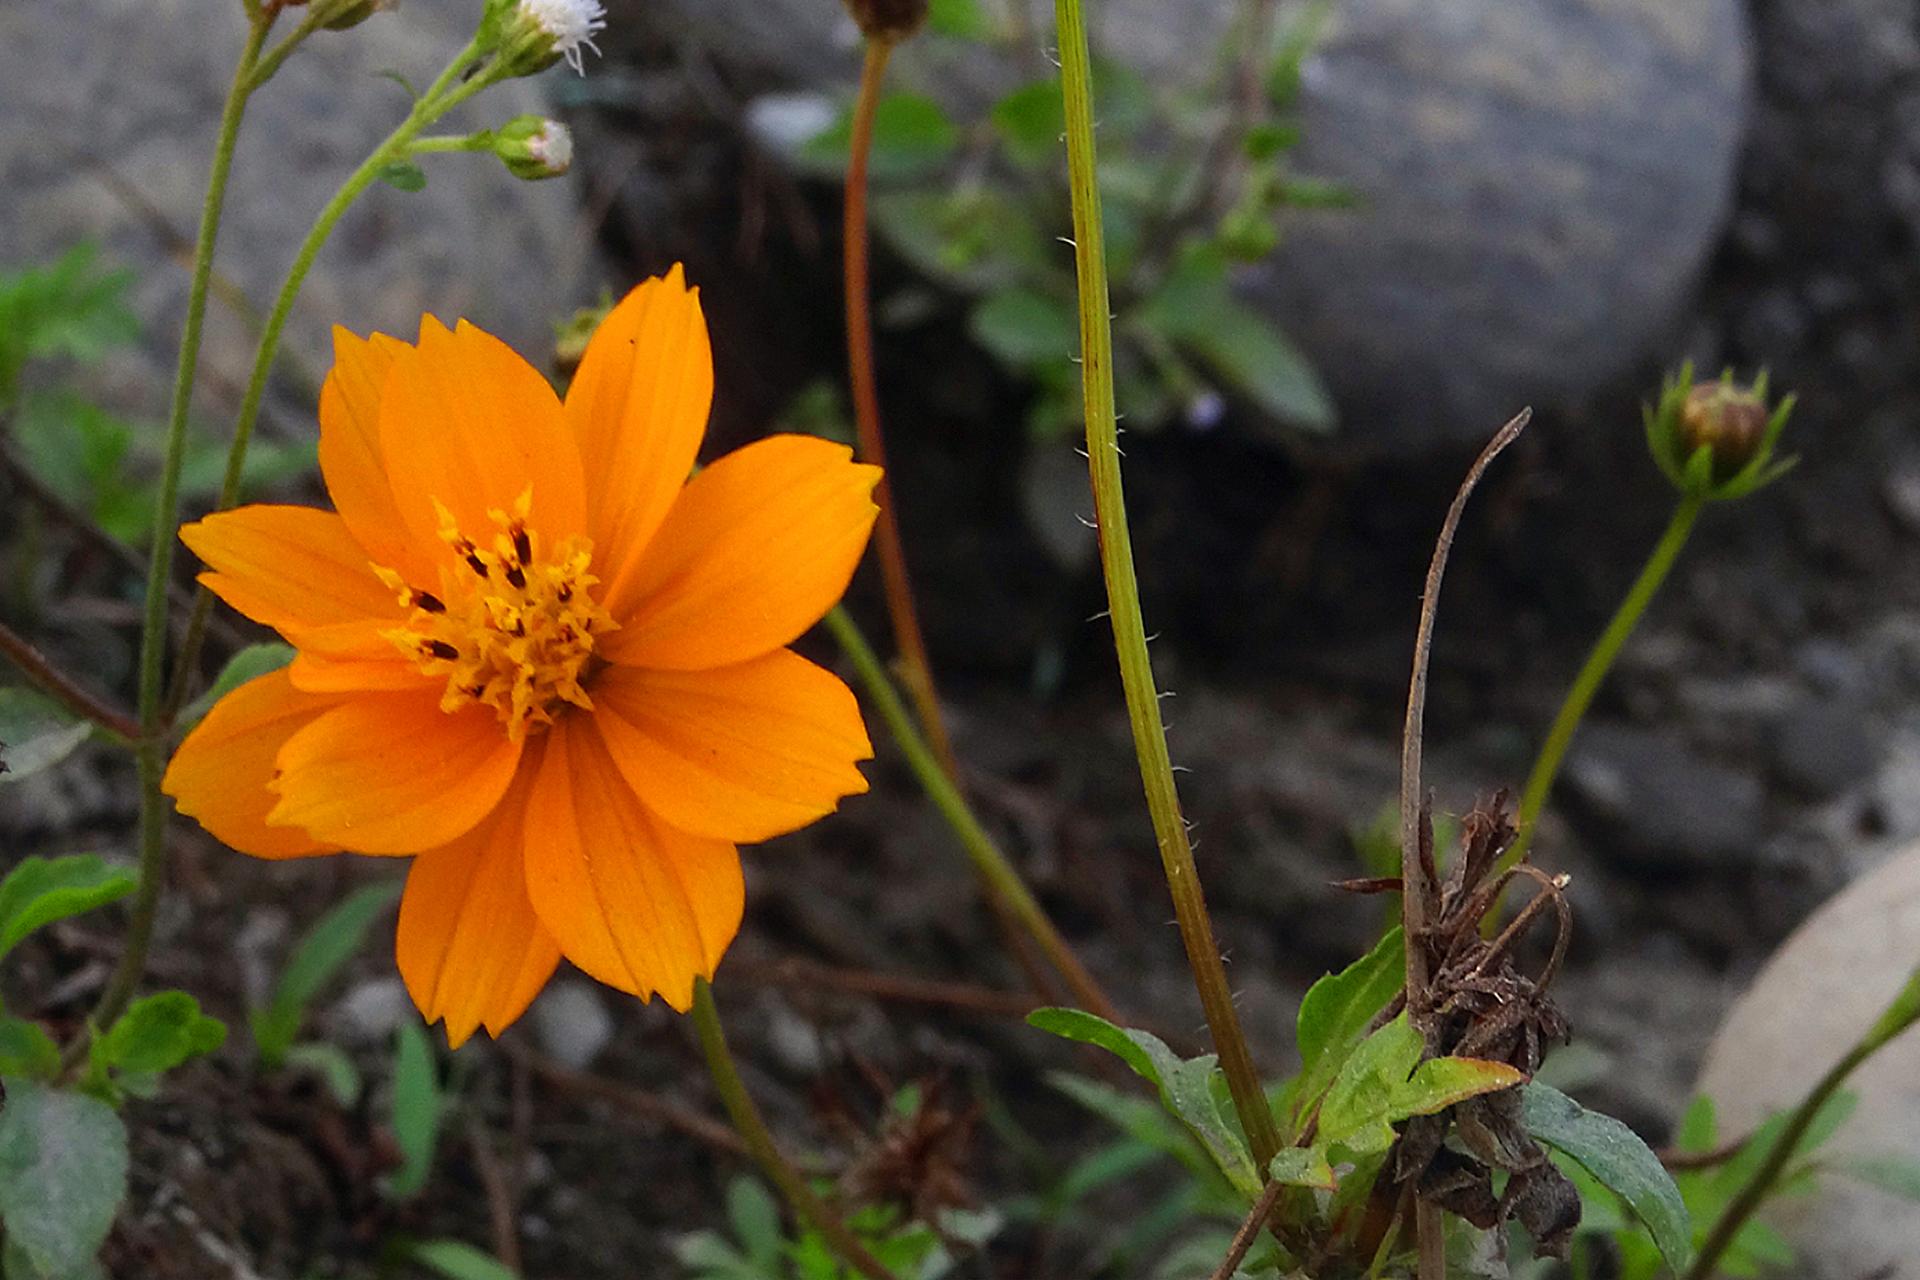 Free Images Orange Flower Flowering Plant Petal Yellow